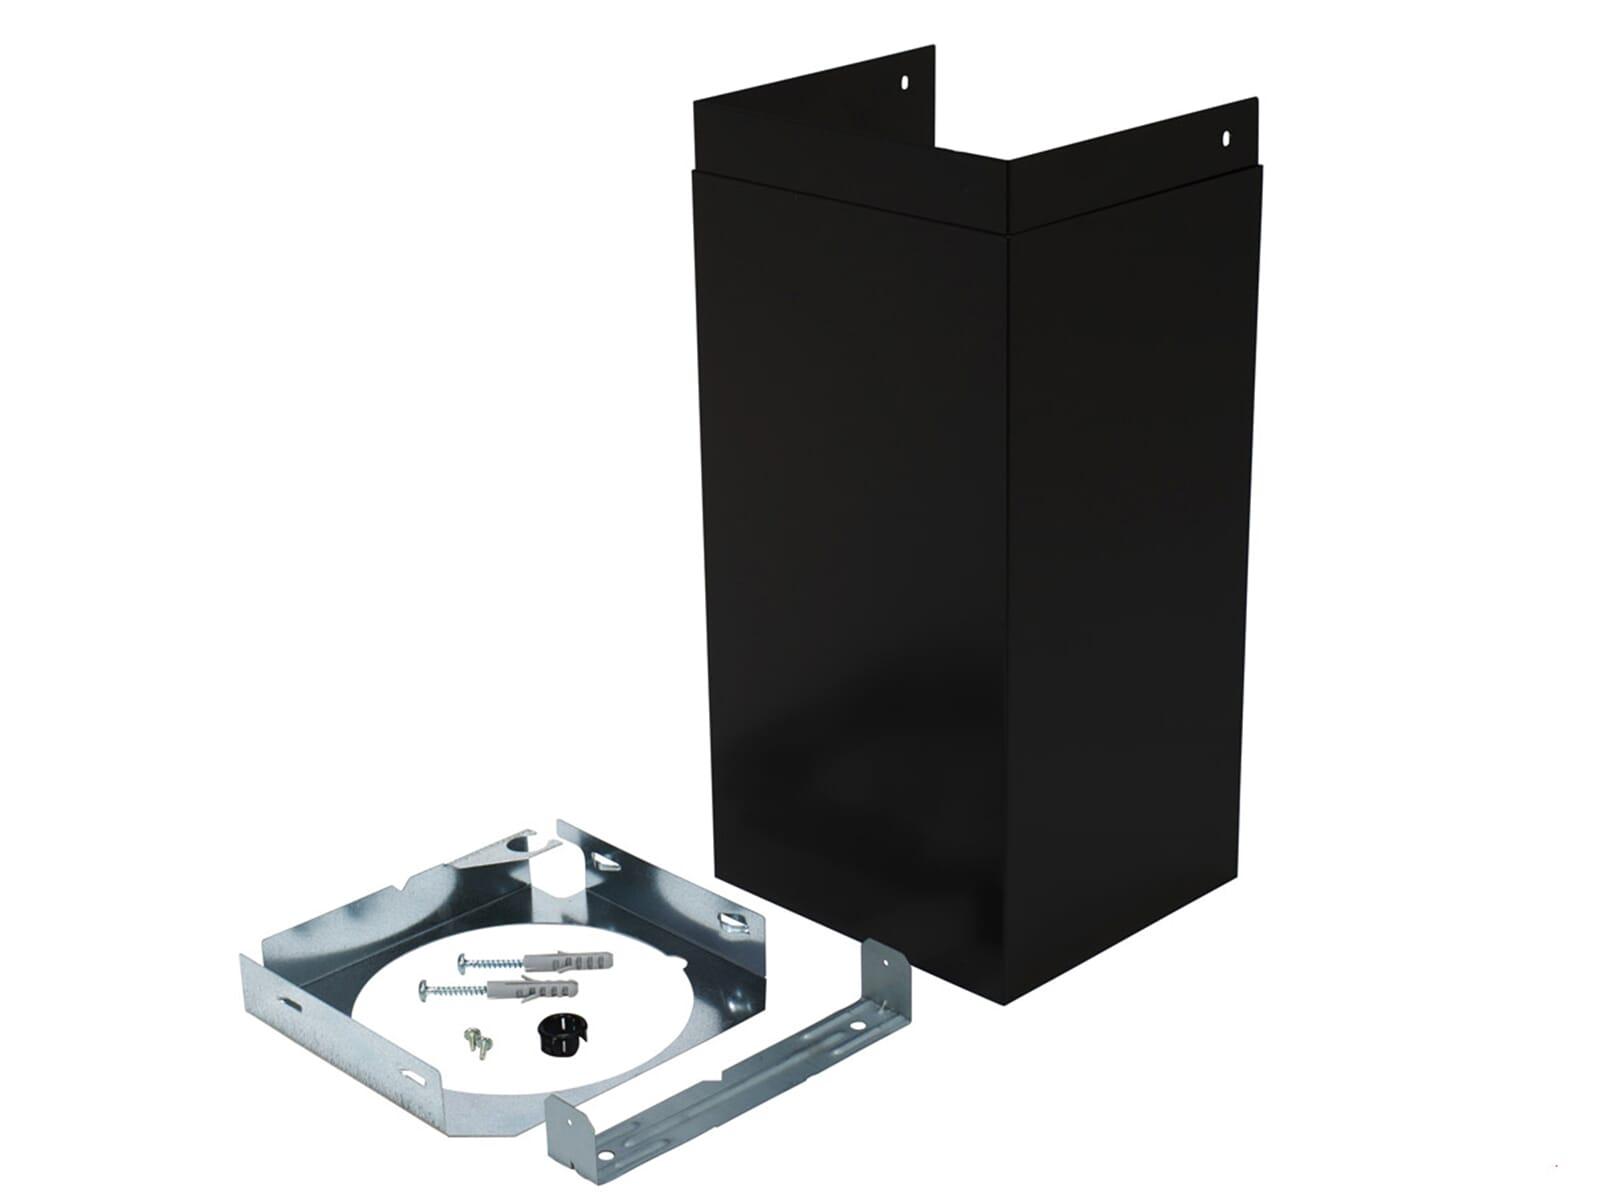 gorenje 228200 kamin f r haube du 6111 s dunstabzugshaube schacht kaminaufsatz ebay. Black Bedroom Furniture Sets. Home Design Ideas